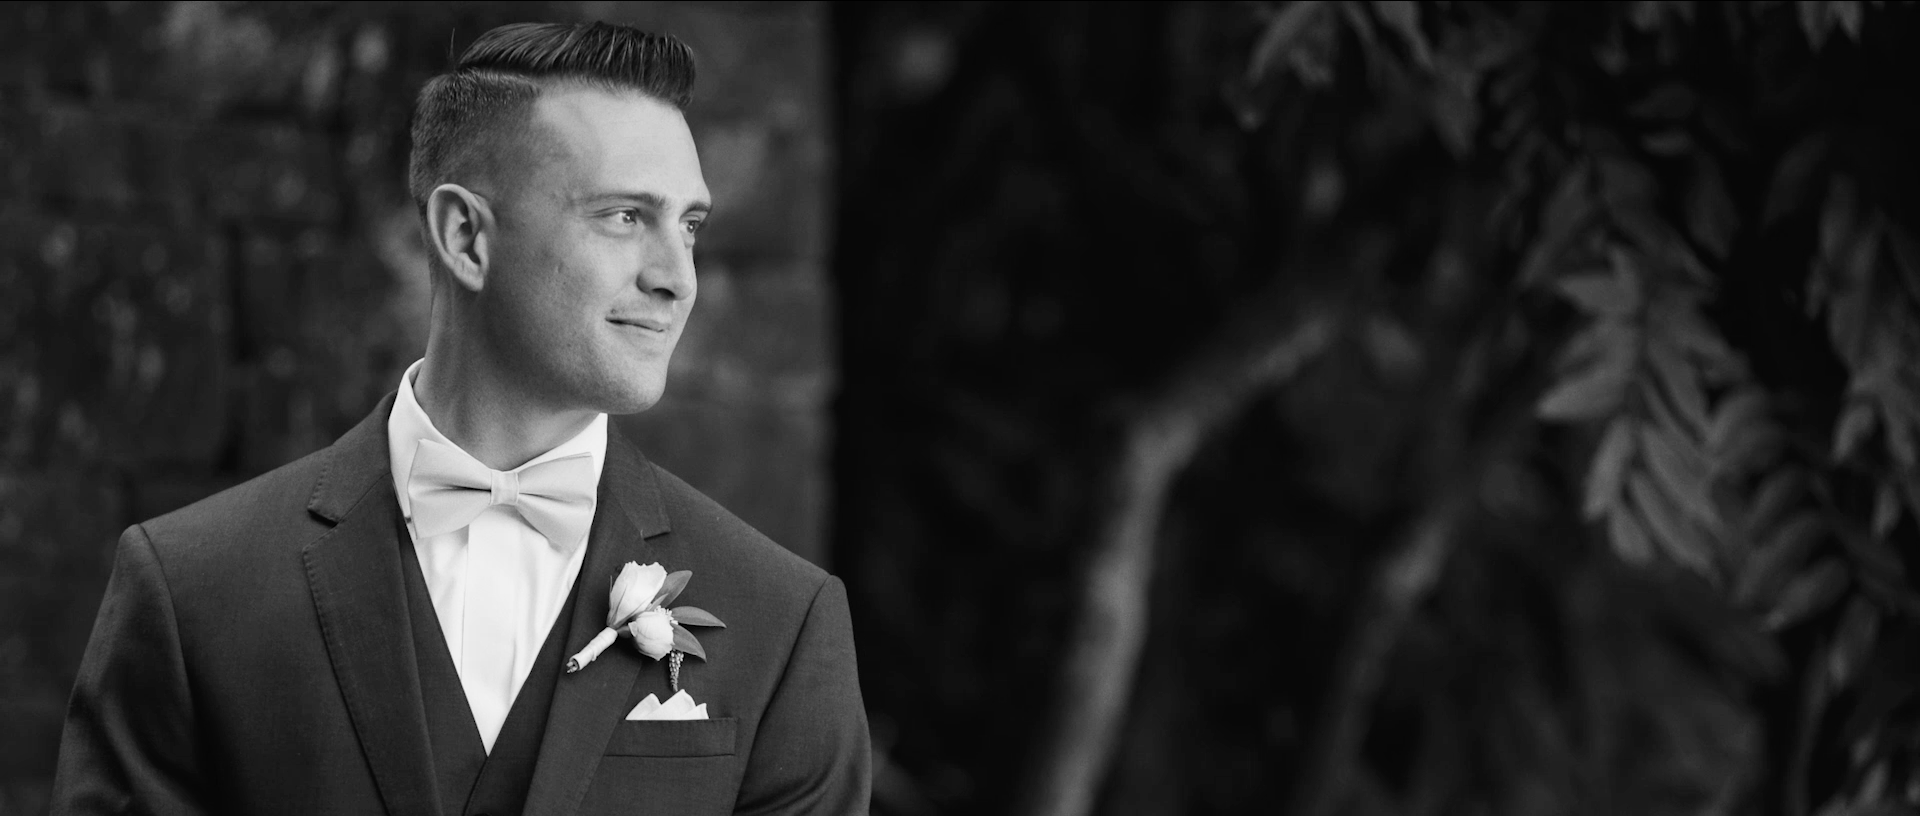 Lewis+Clark+College+Wedding+Videographer+Photographer_008.png